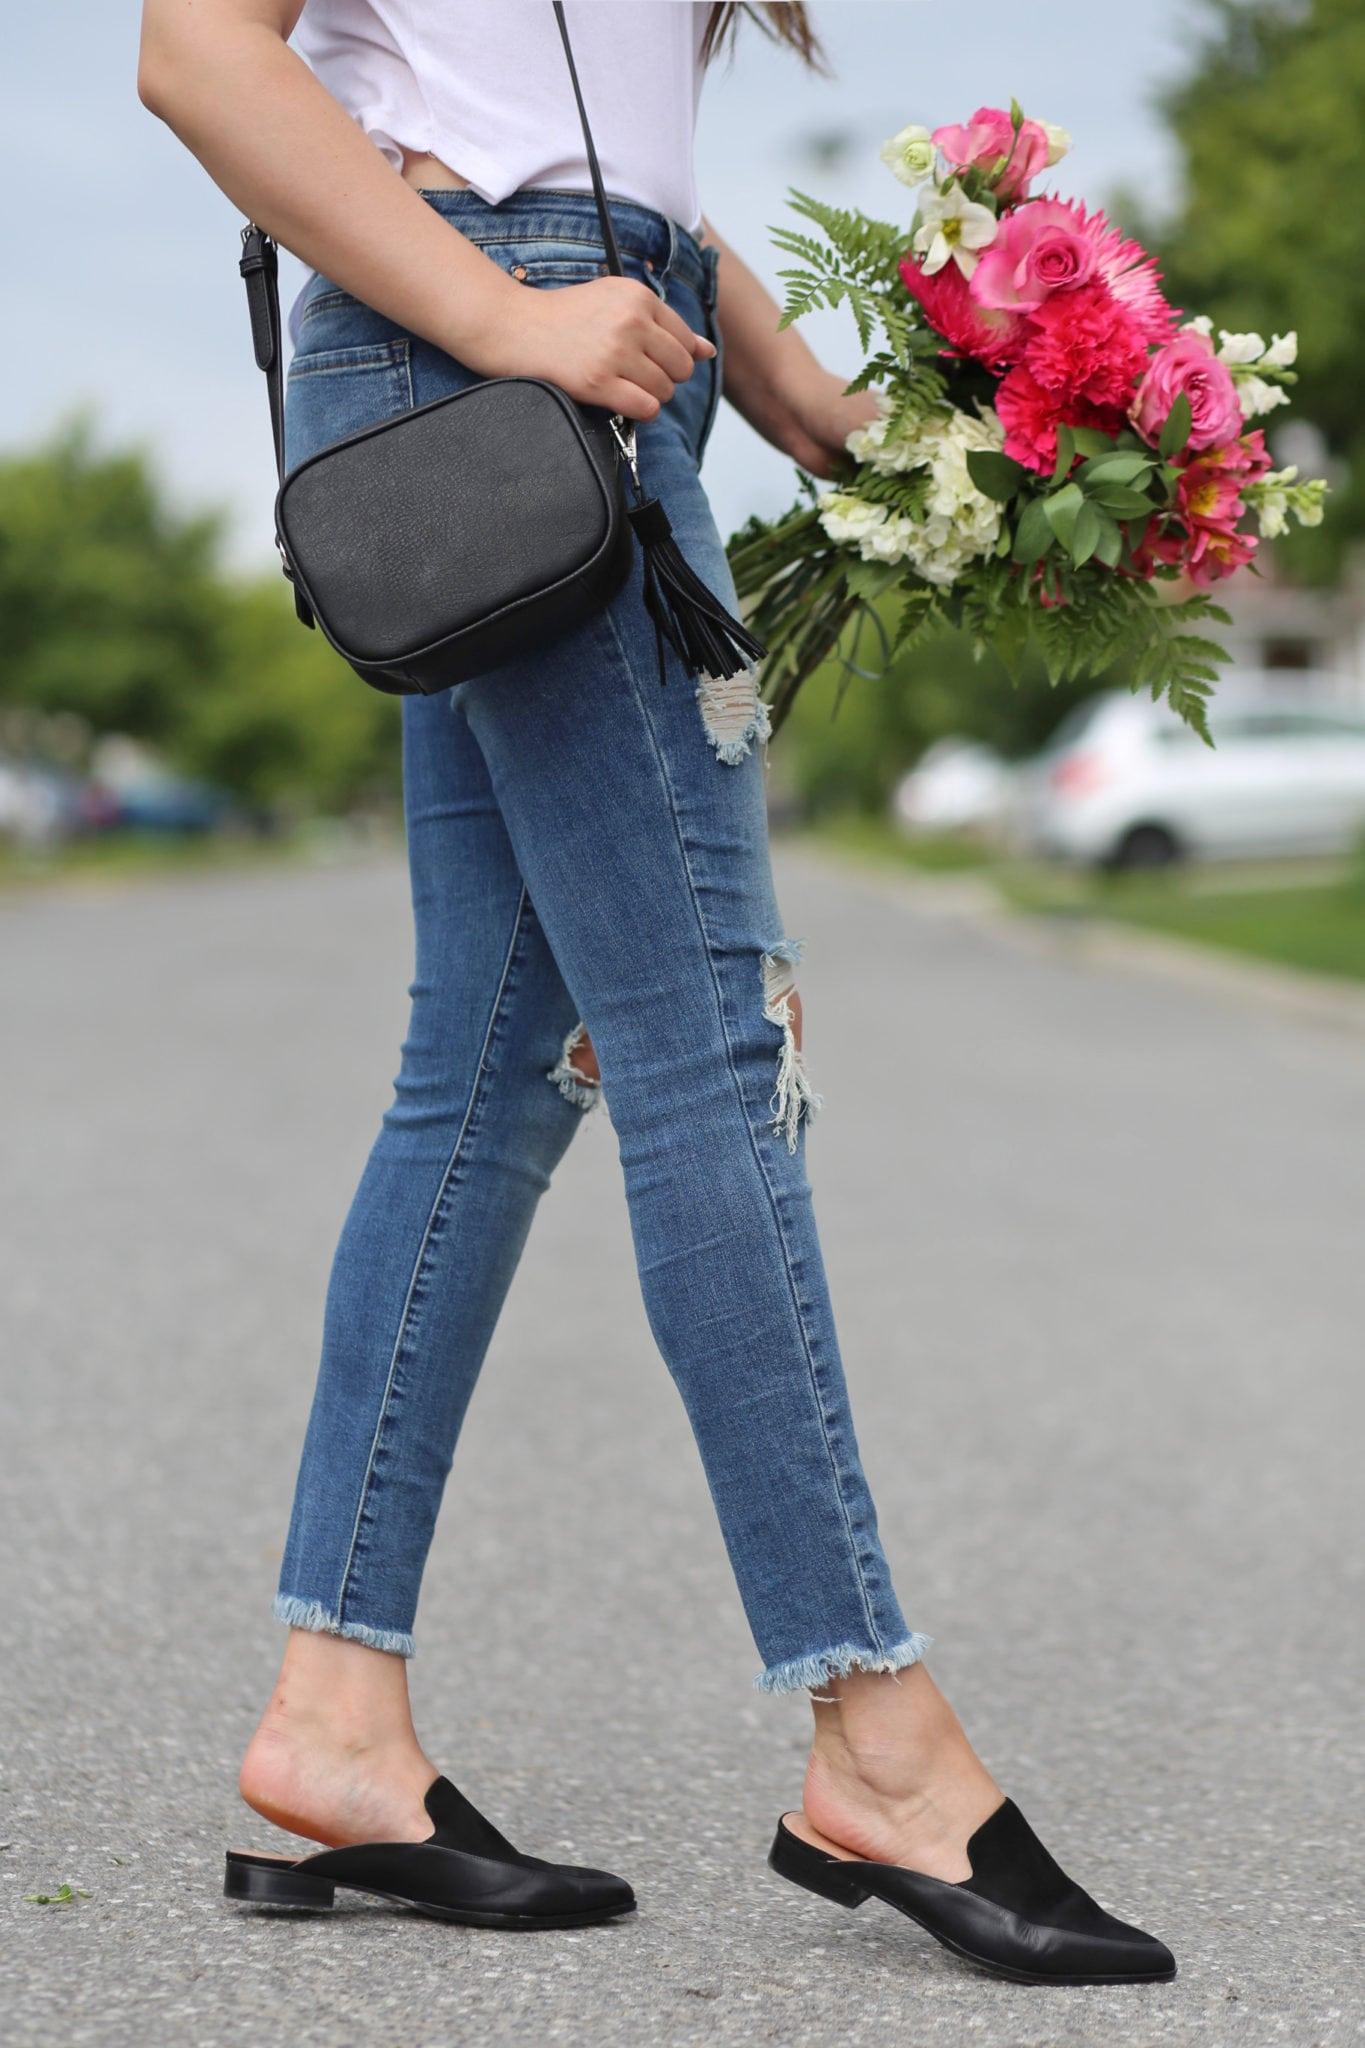 cutout choker shirt white blue jeans fall trends Mash Elle crossbody bag flowers